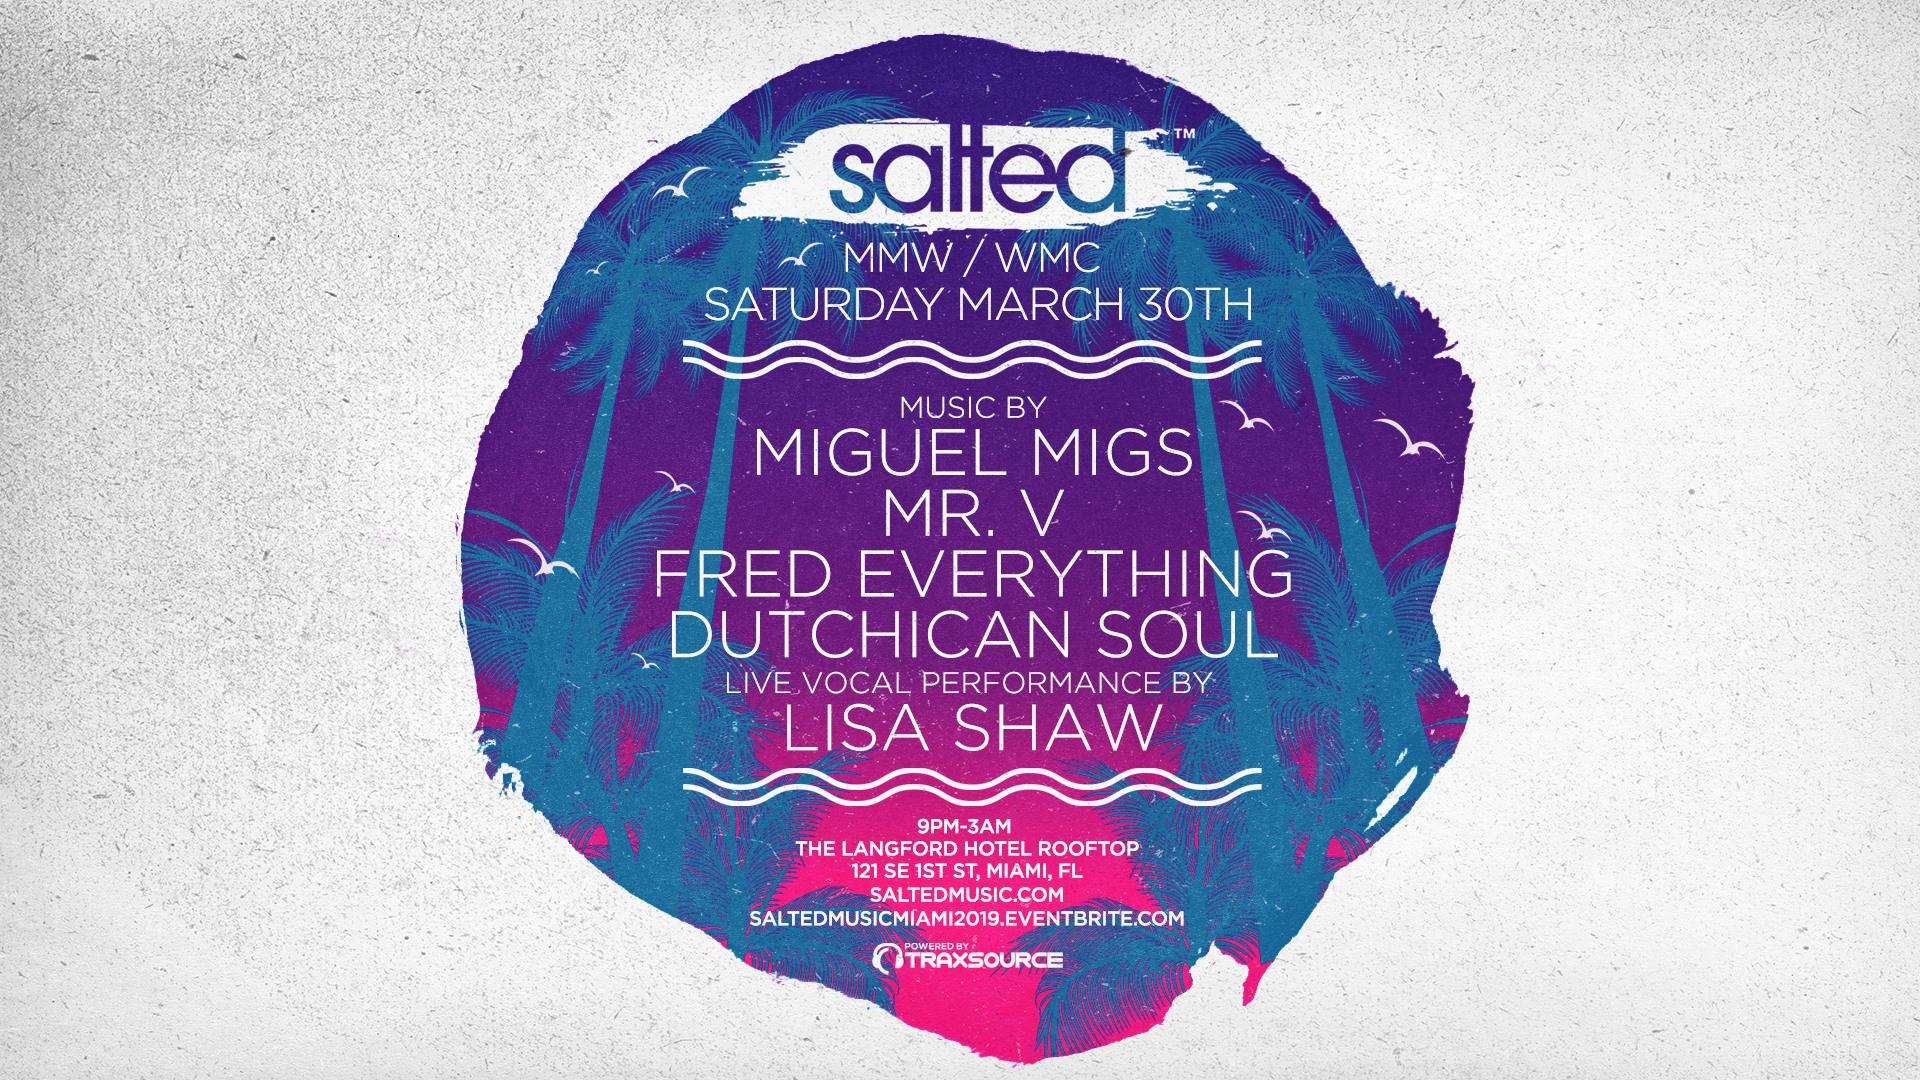 Salted Music Miami 2019 Image